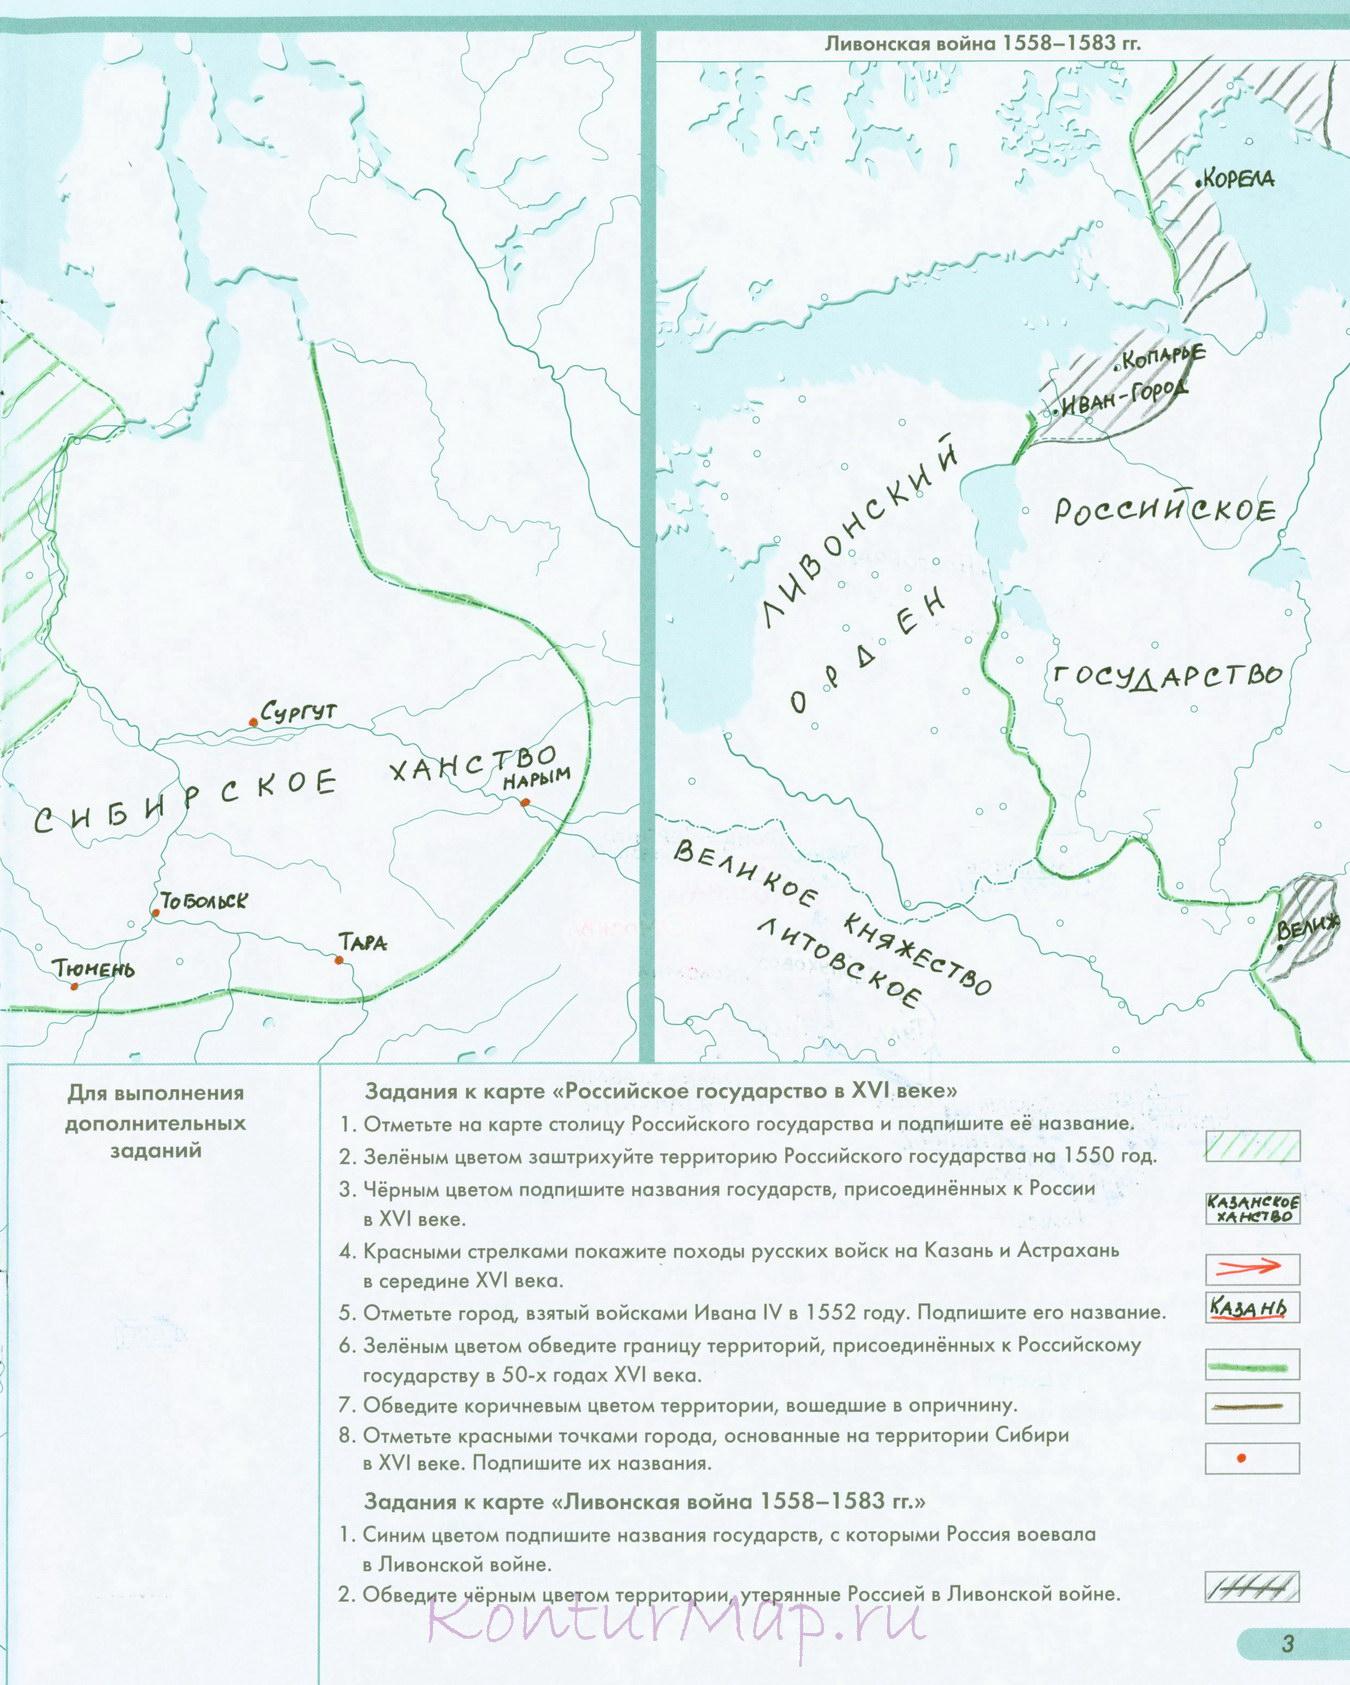 gdz-konturnie-karti-po-istorii-rossii-6-klass-arsentev-istoki